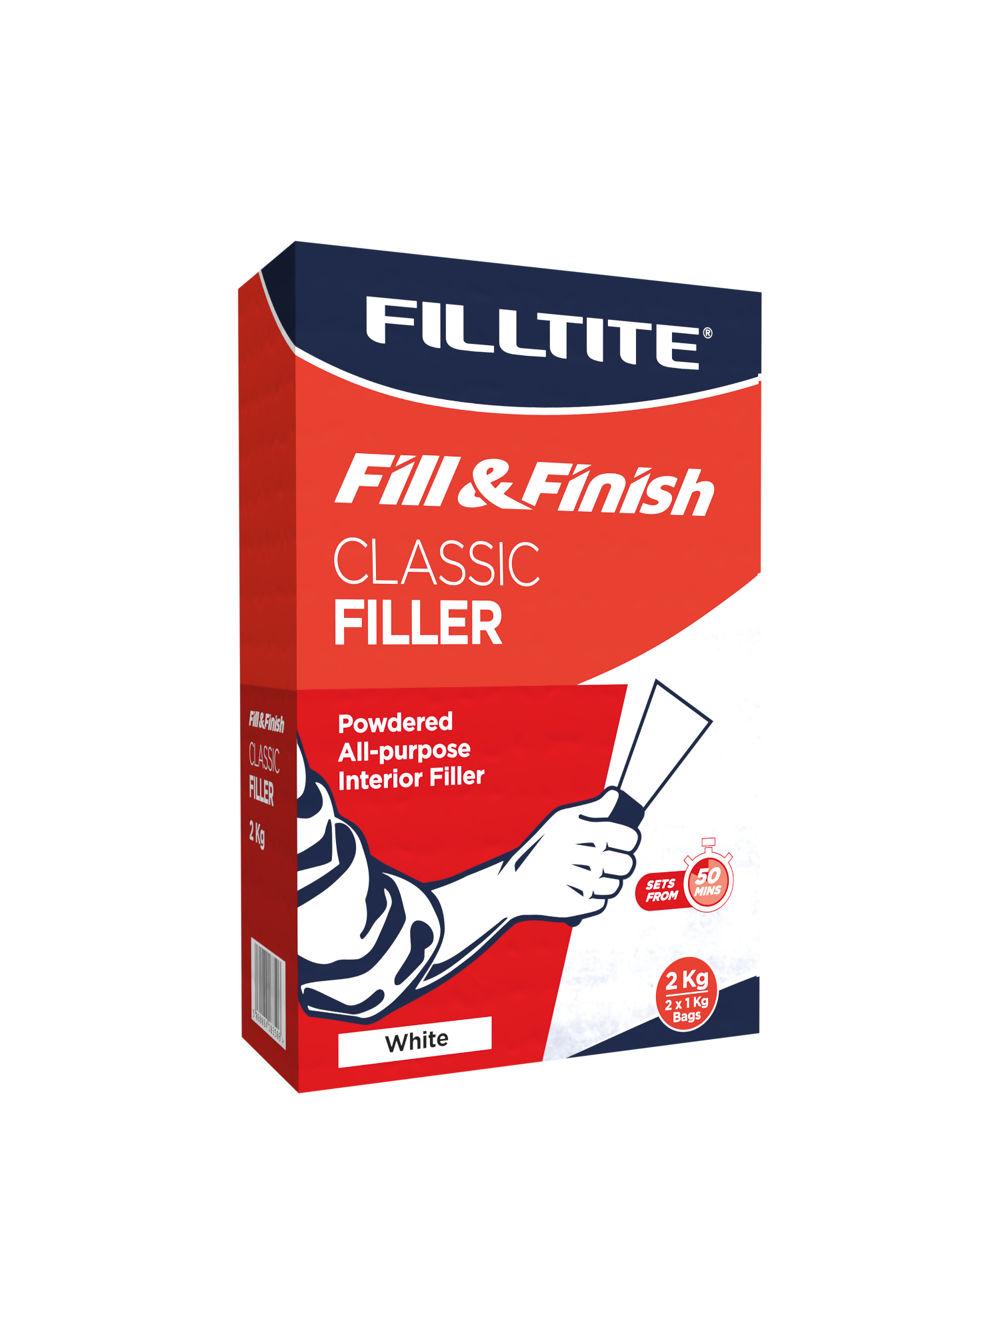 Filltite Fill & Finish Classic Filler Ref F18350